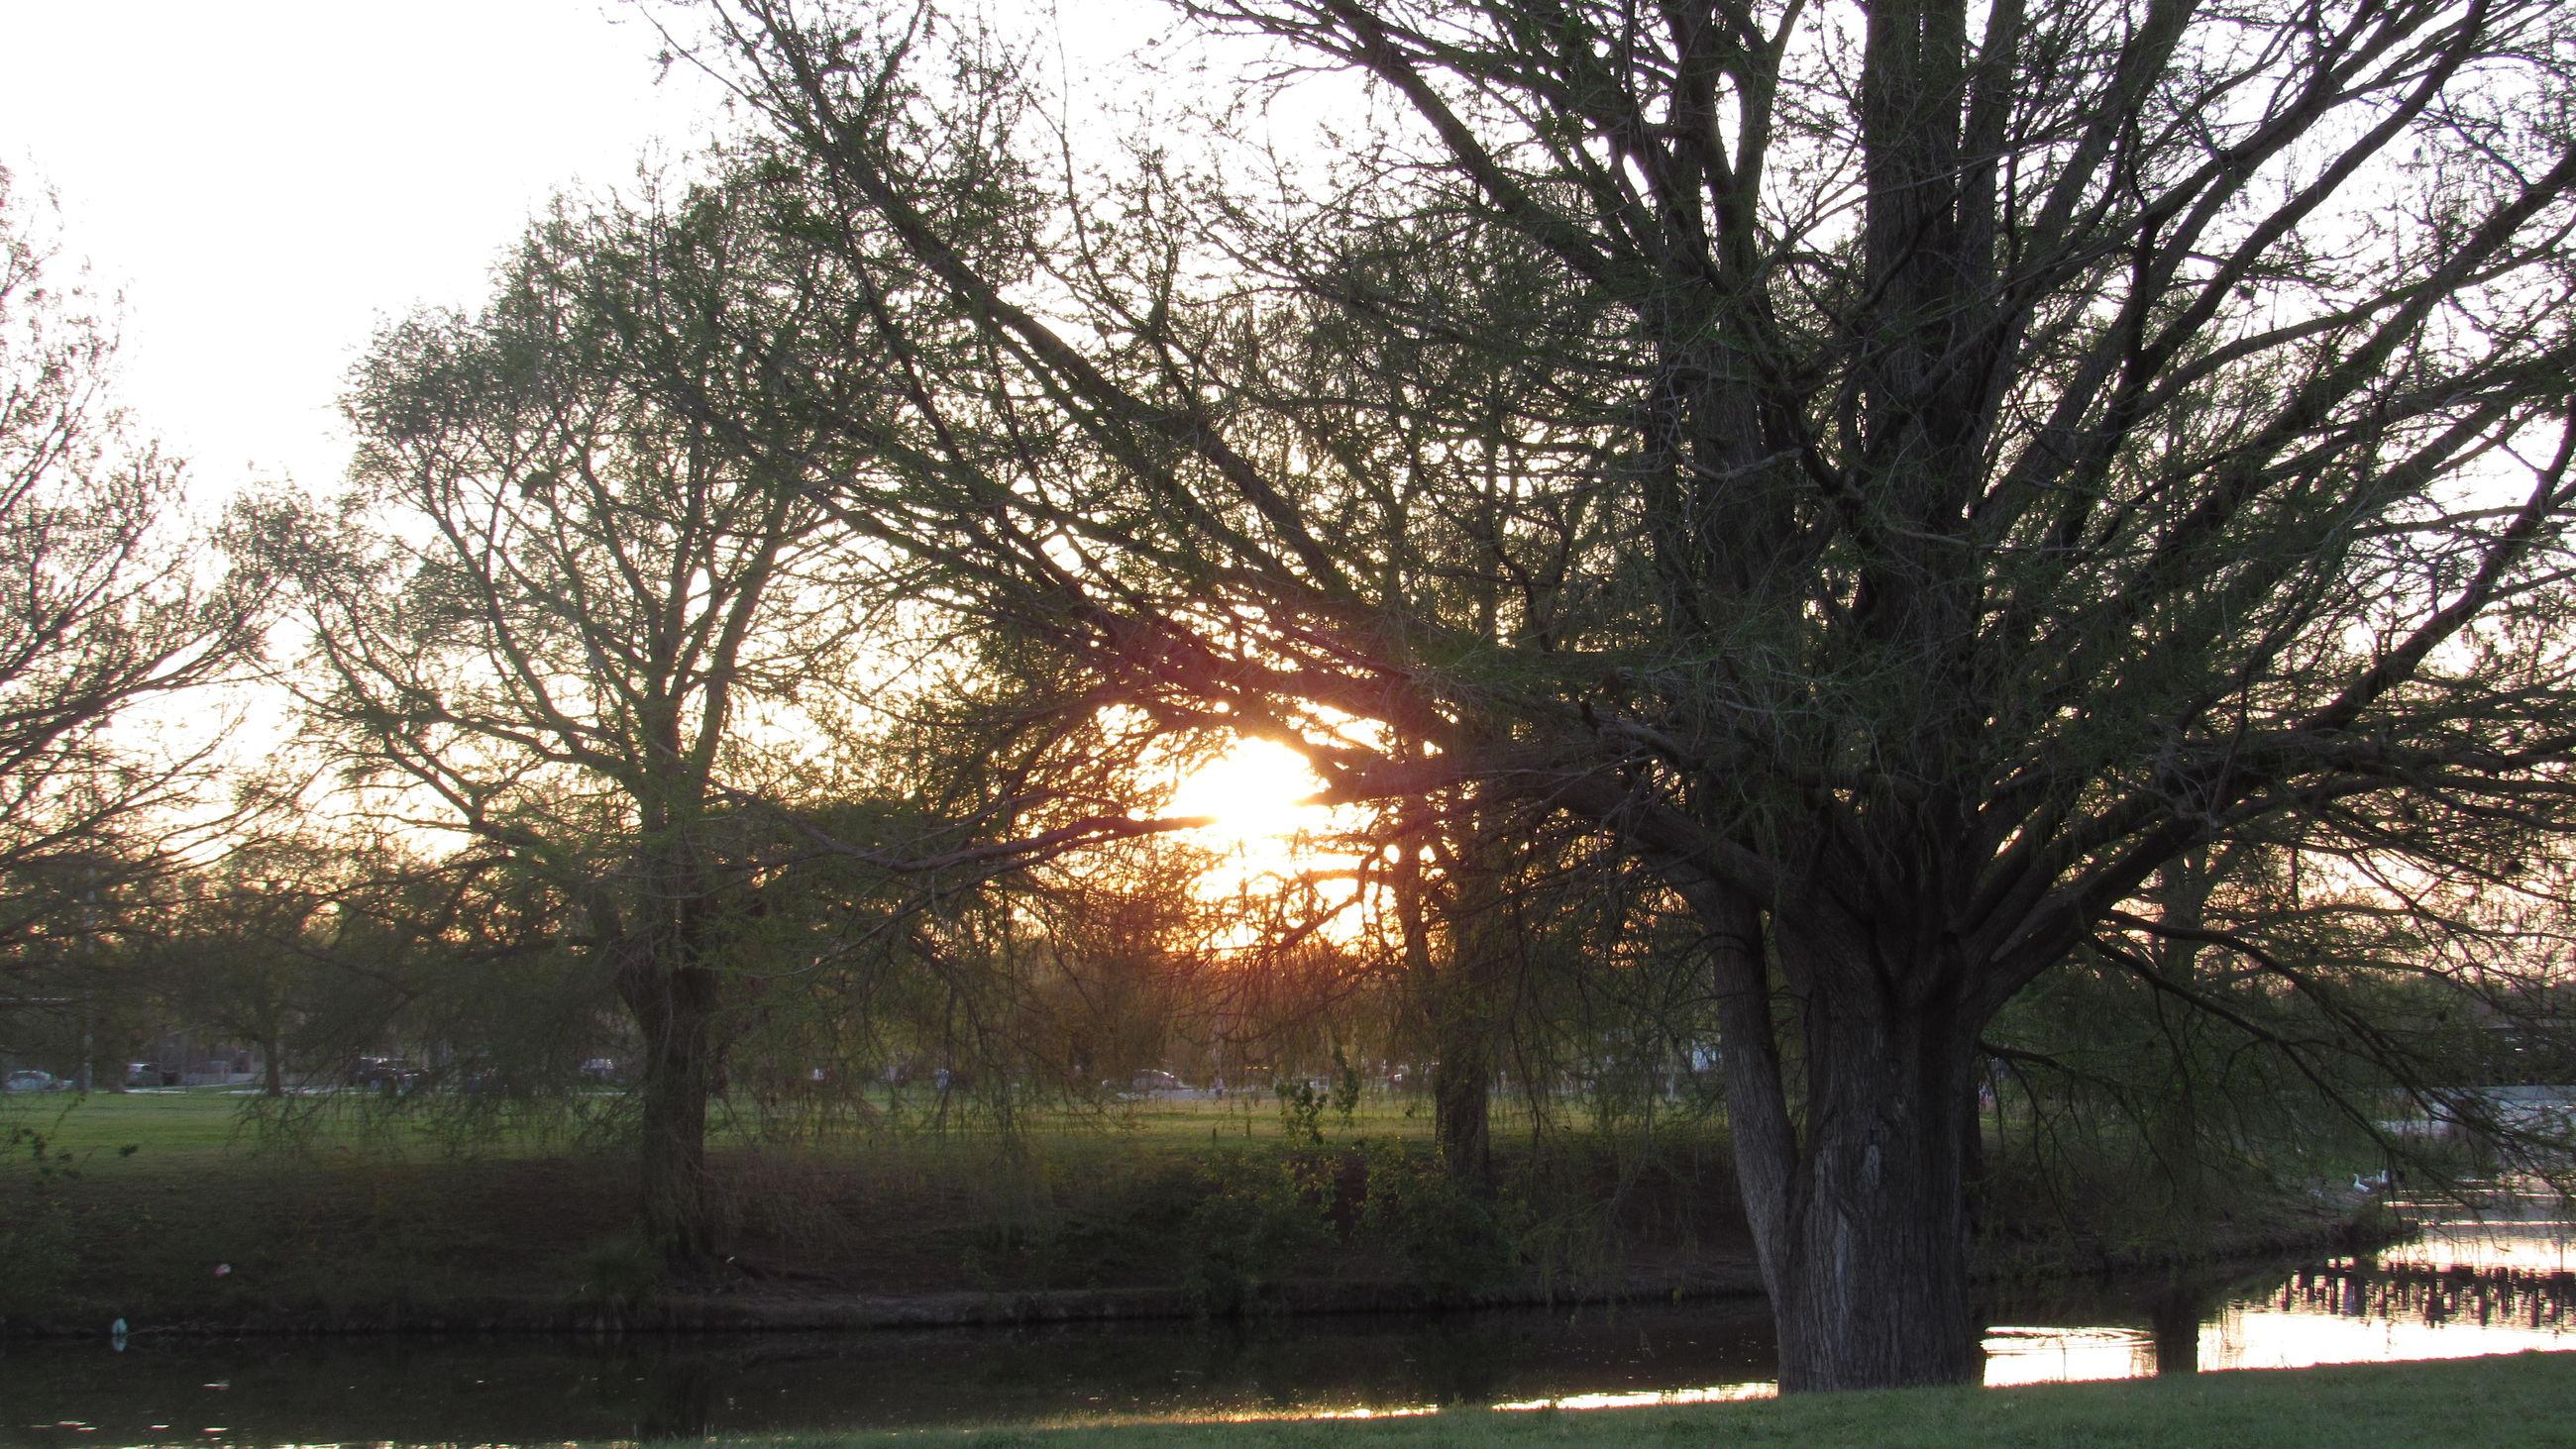 tree, tranquility, tranquil scene, sunset, beauty in nature, scenics, sun, grass, nature, sunlight, bare tree, growth, landscape, sky, idyllic, tree trunk, no people, non-urban scene, outdoors, sunbeam, orange color, remote, grassy, park, green color, travel destinations, non urban scene